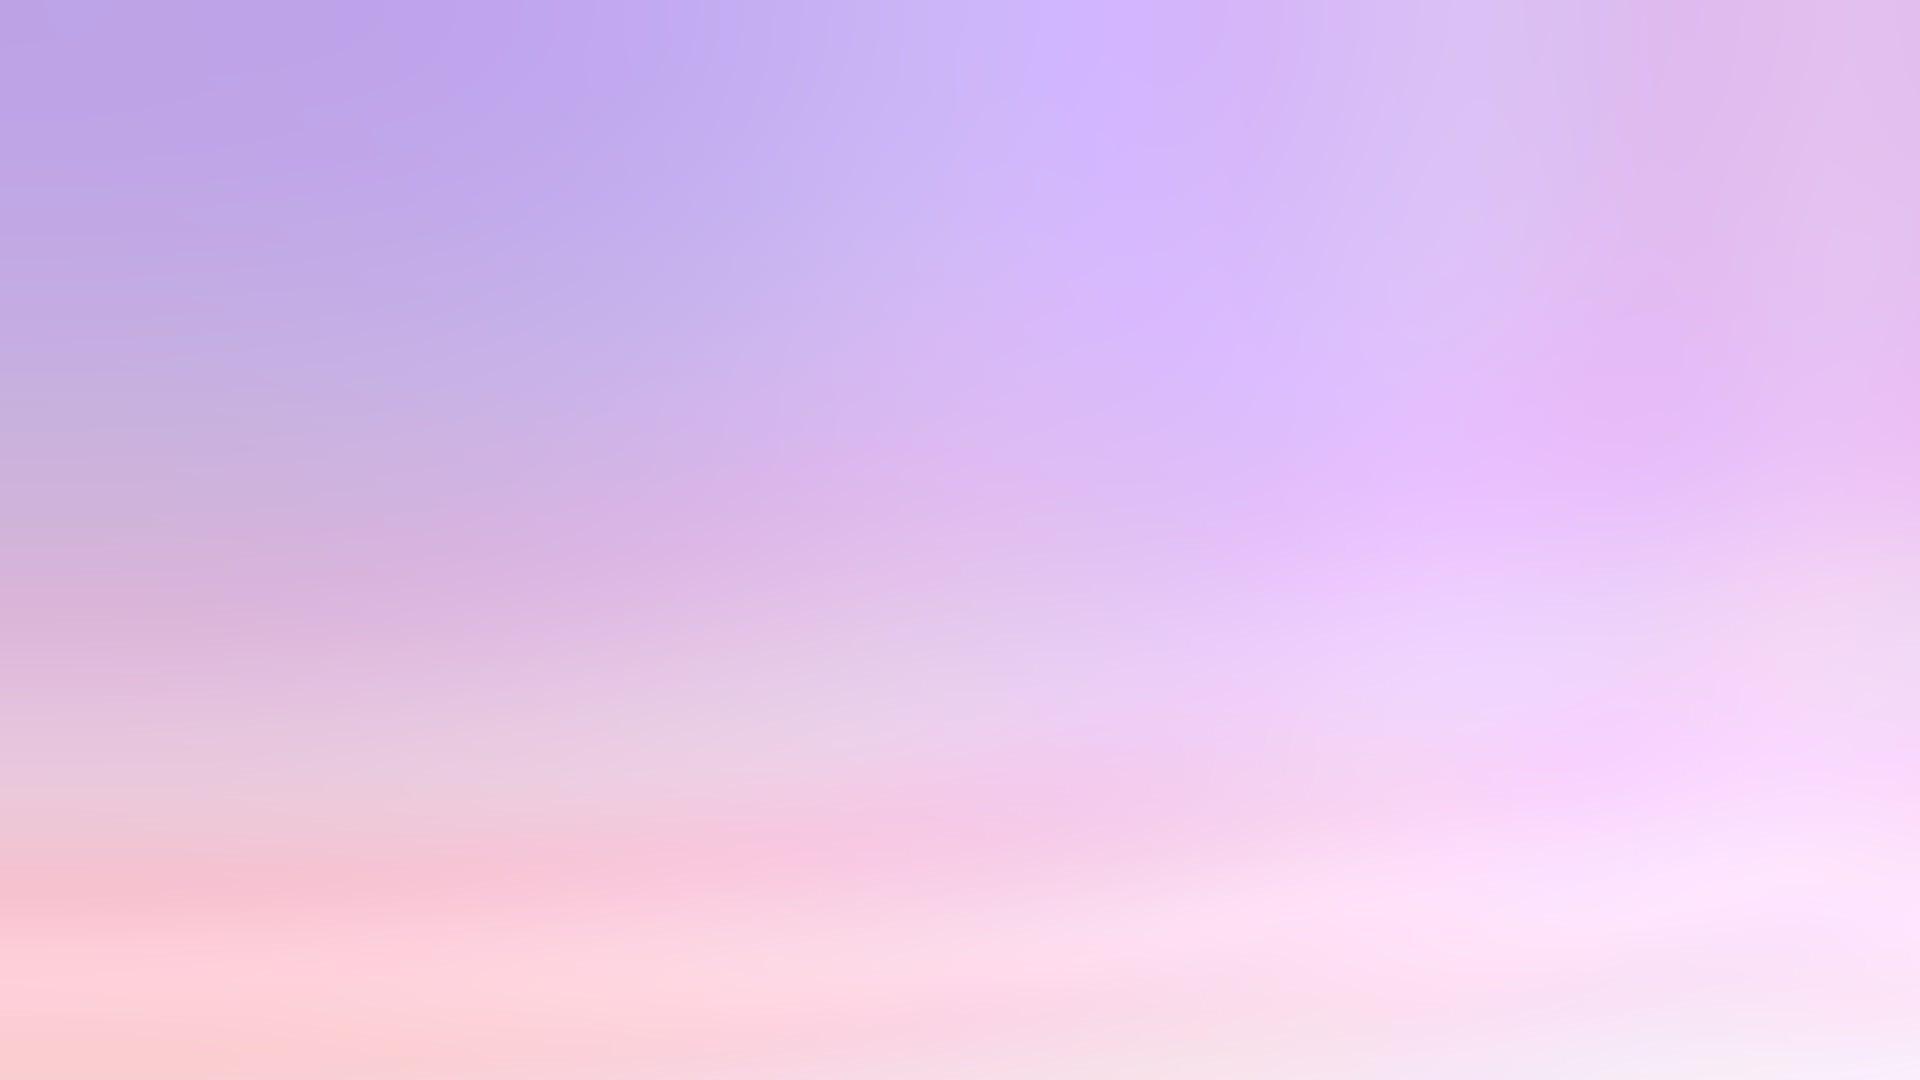 Pastel pink wallpapers top free pastel pink backgrounds - Pastel pink wallpaper hd ...